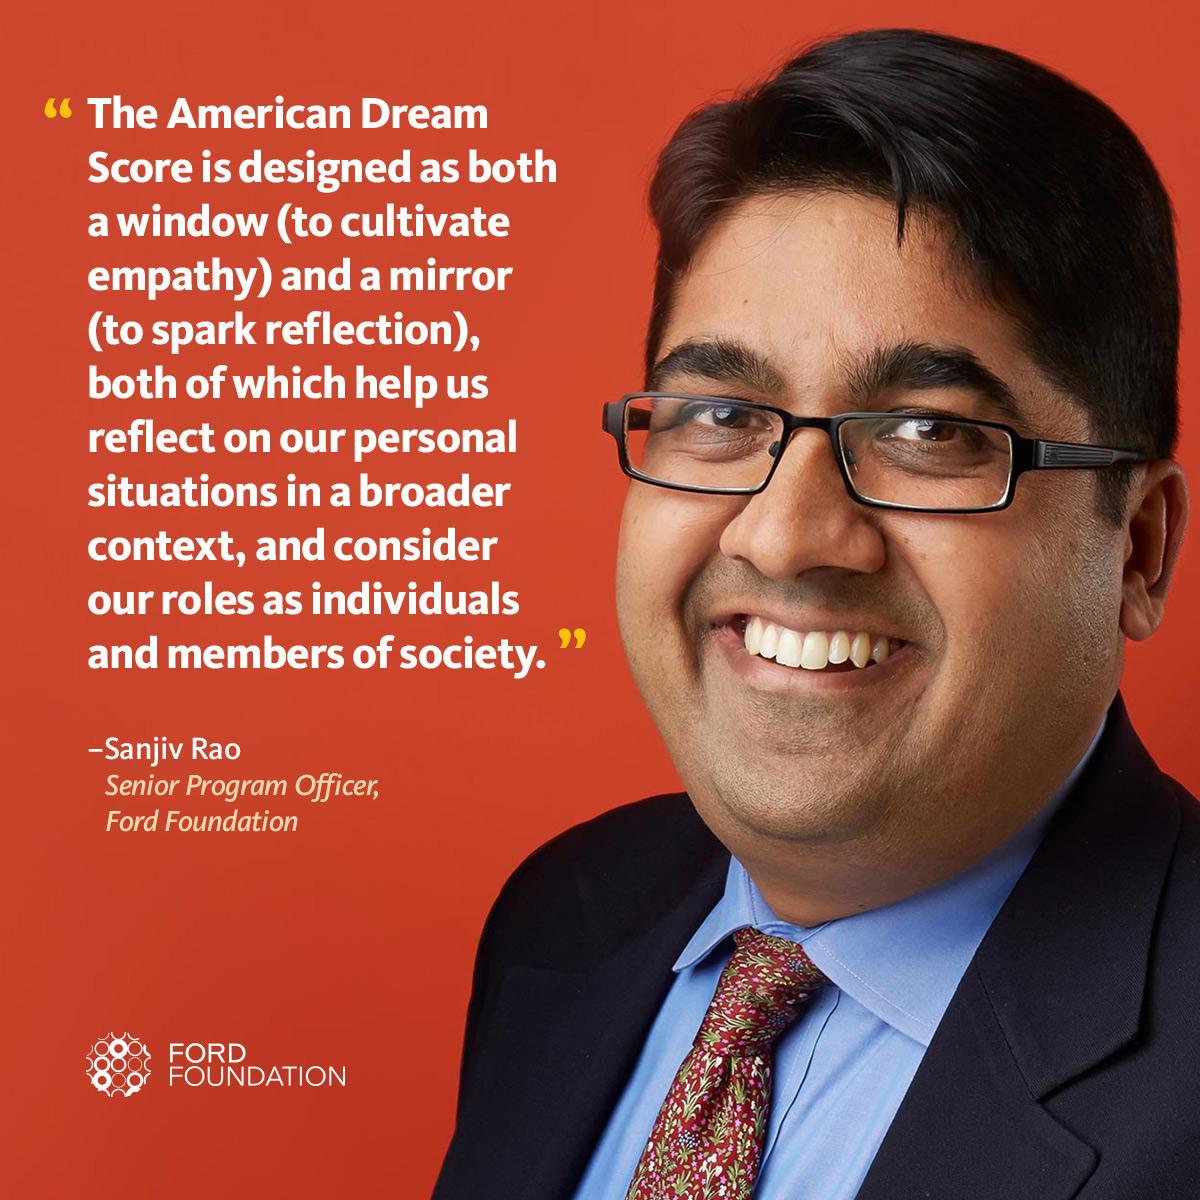 Sanjiv Rao reflects on his American Dream Score